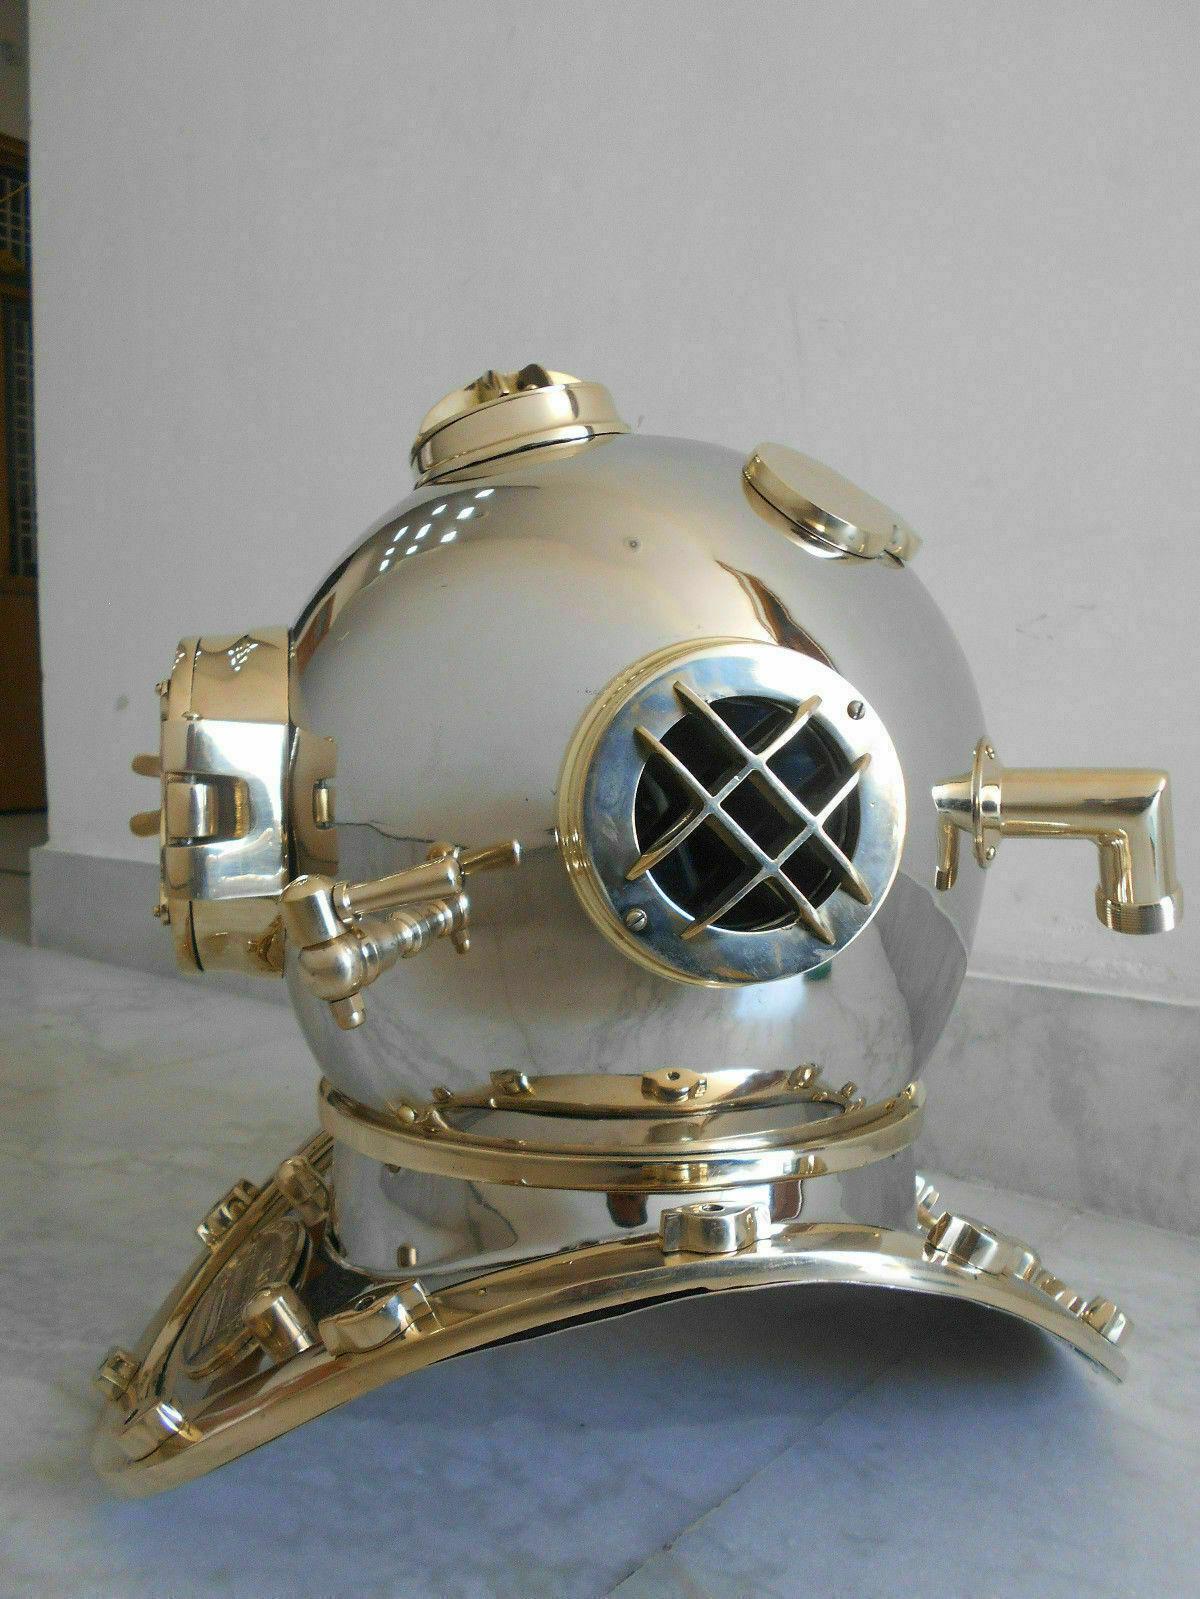 Solid Copper Brass Mark V Diving Divers Helmet U.S Navy Nautical Full Size 18  - $236.55